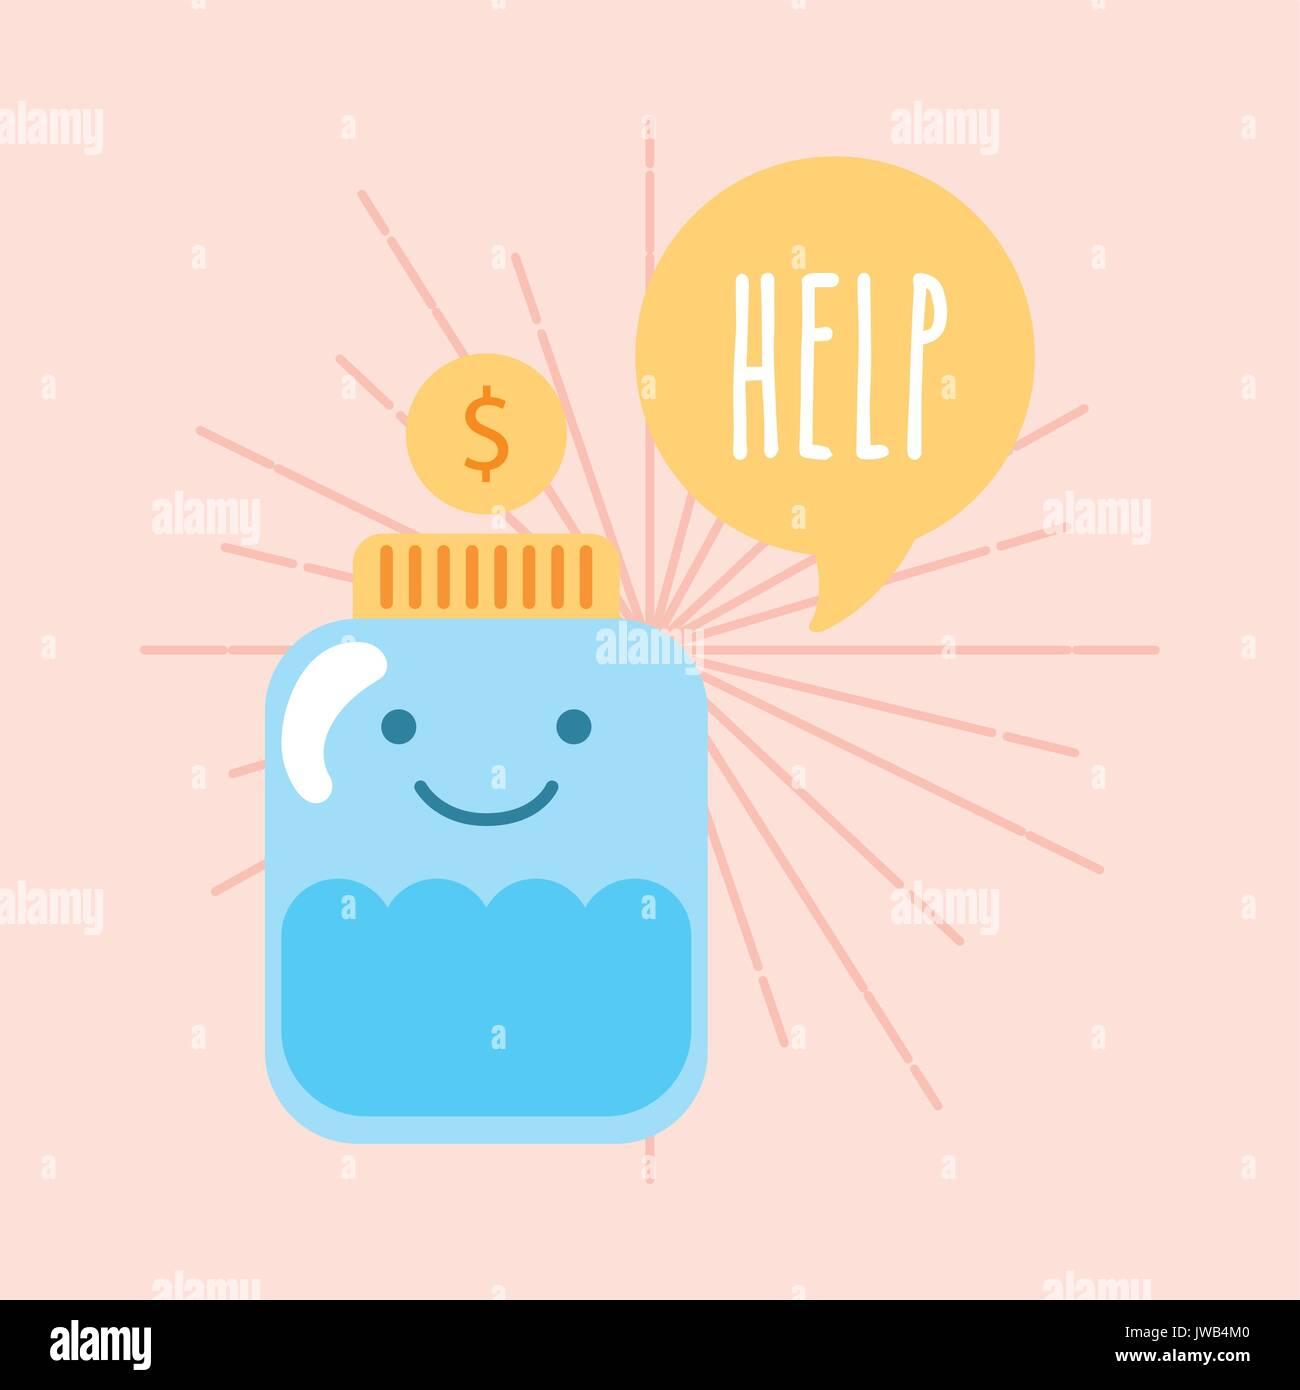 Help donations children - Stock Image